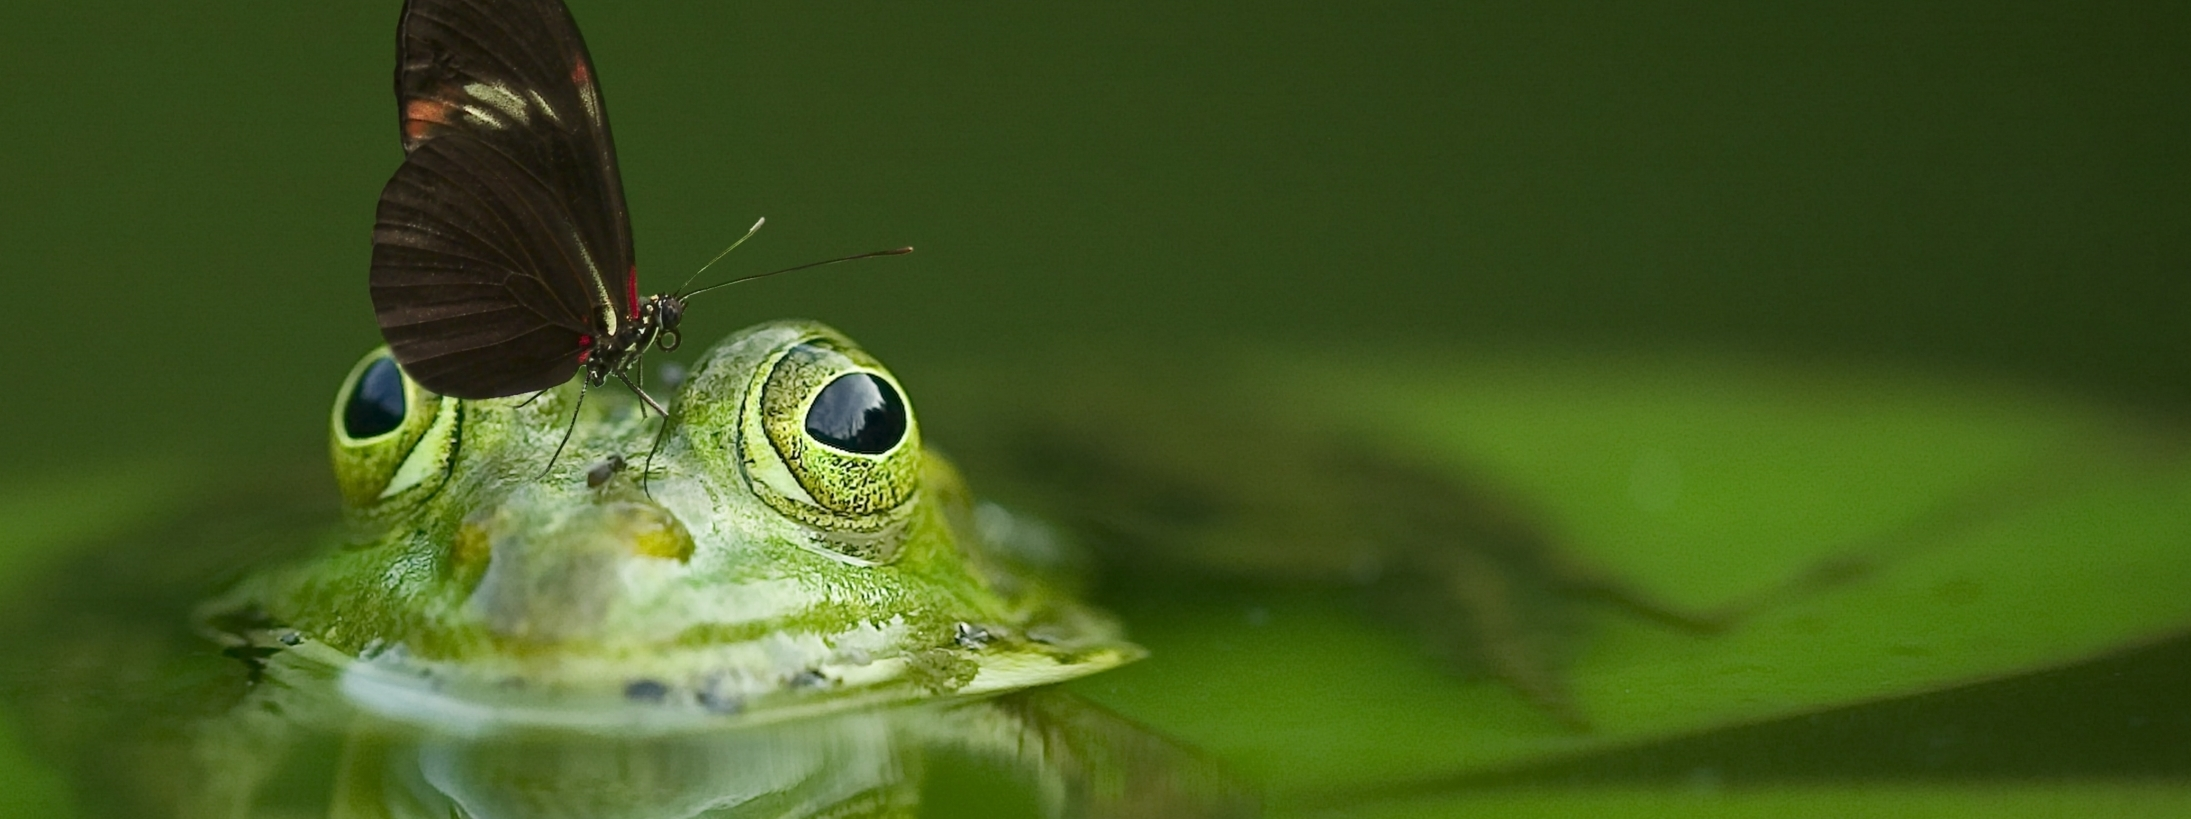 Ambidestrismo Frog